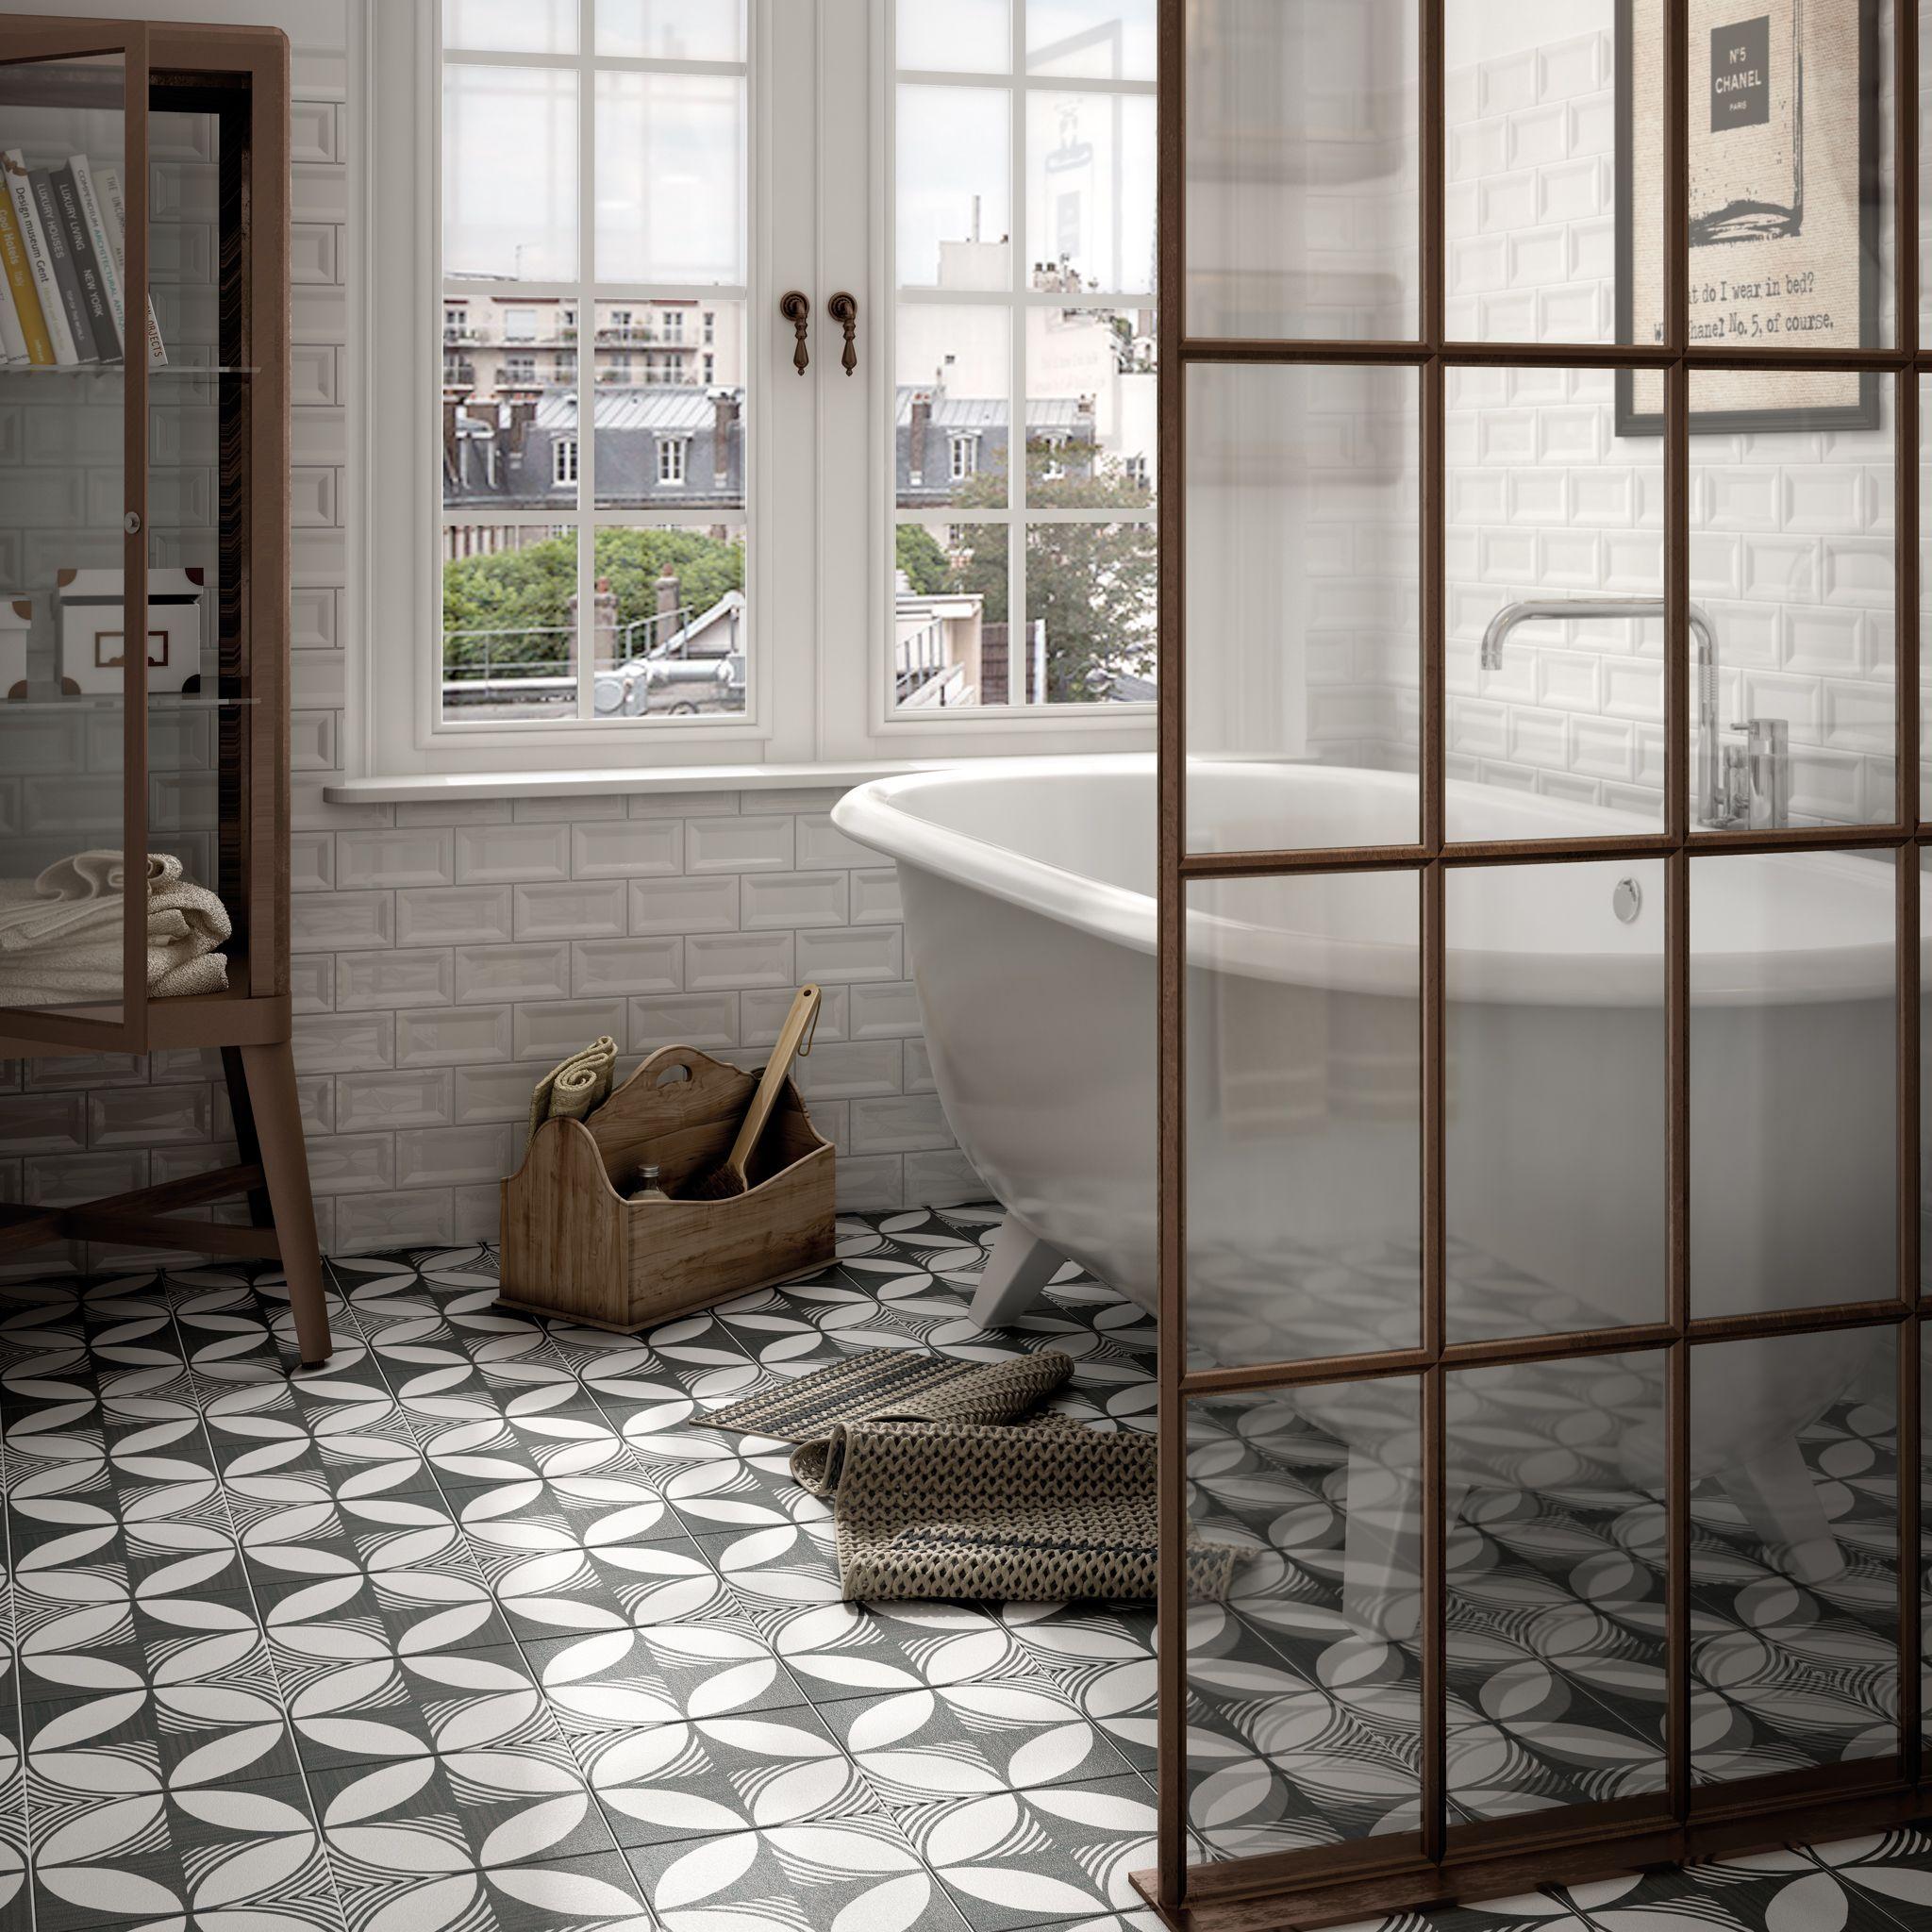 London Funk Patterned Bathroom Floor tiles. | Decorative Tiles ...